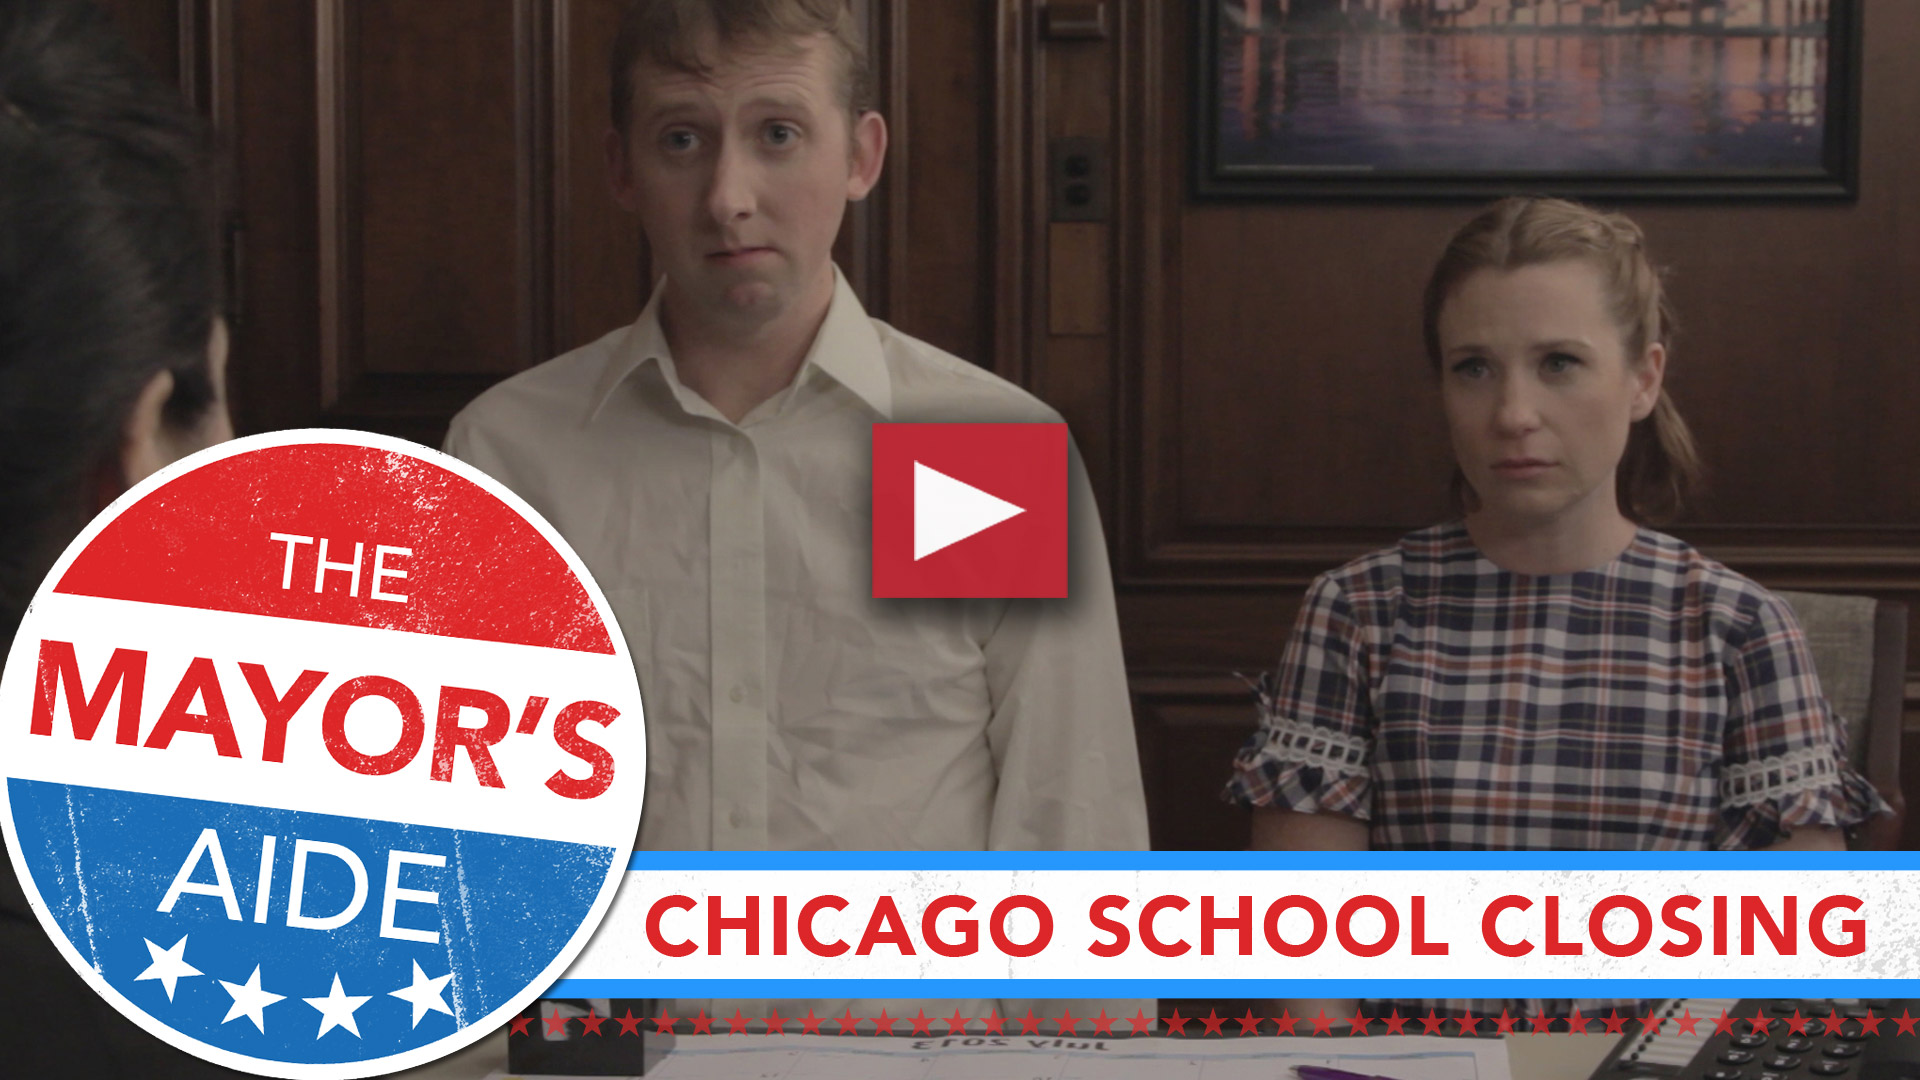 The Mayor's Aide – Chicago School Closings